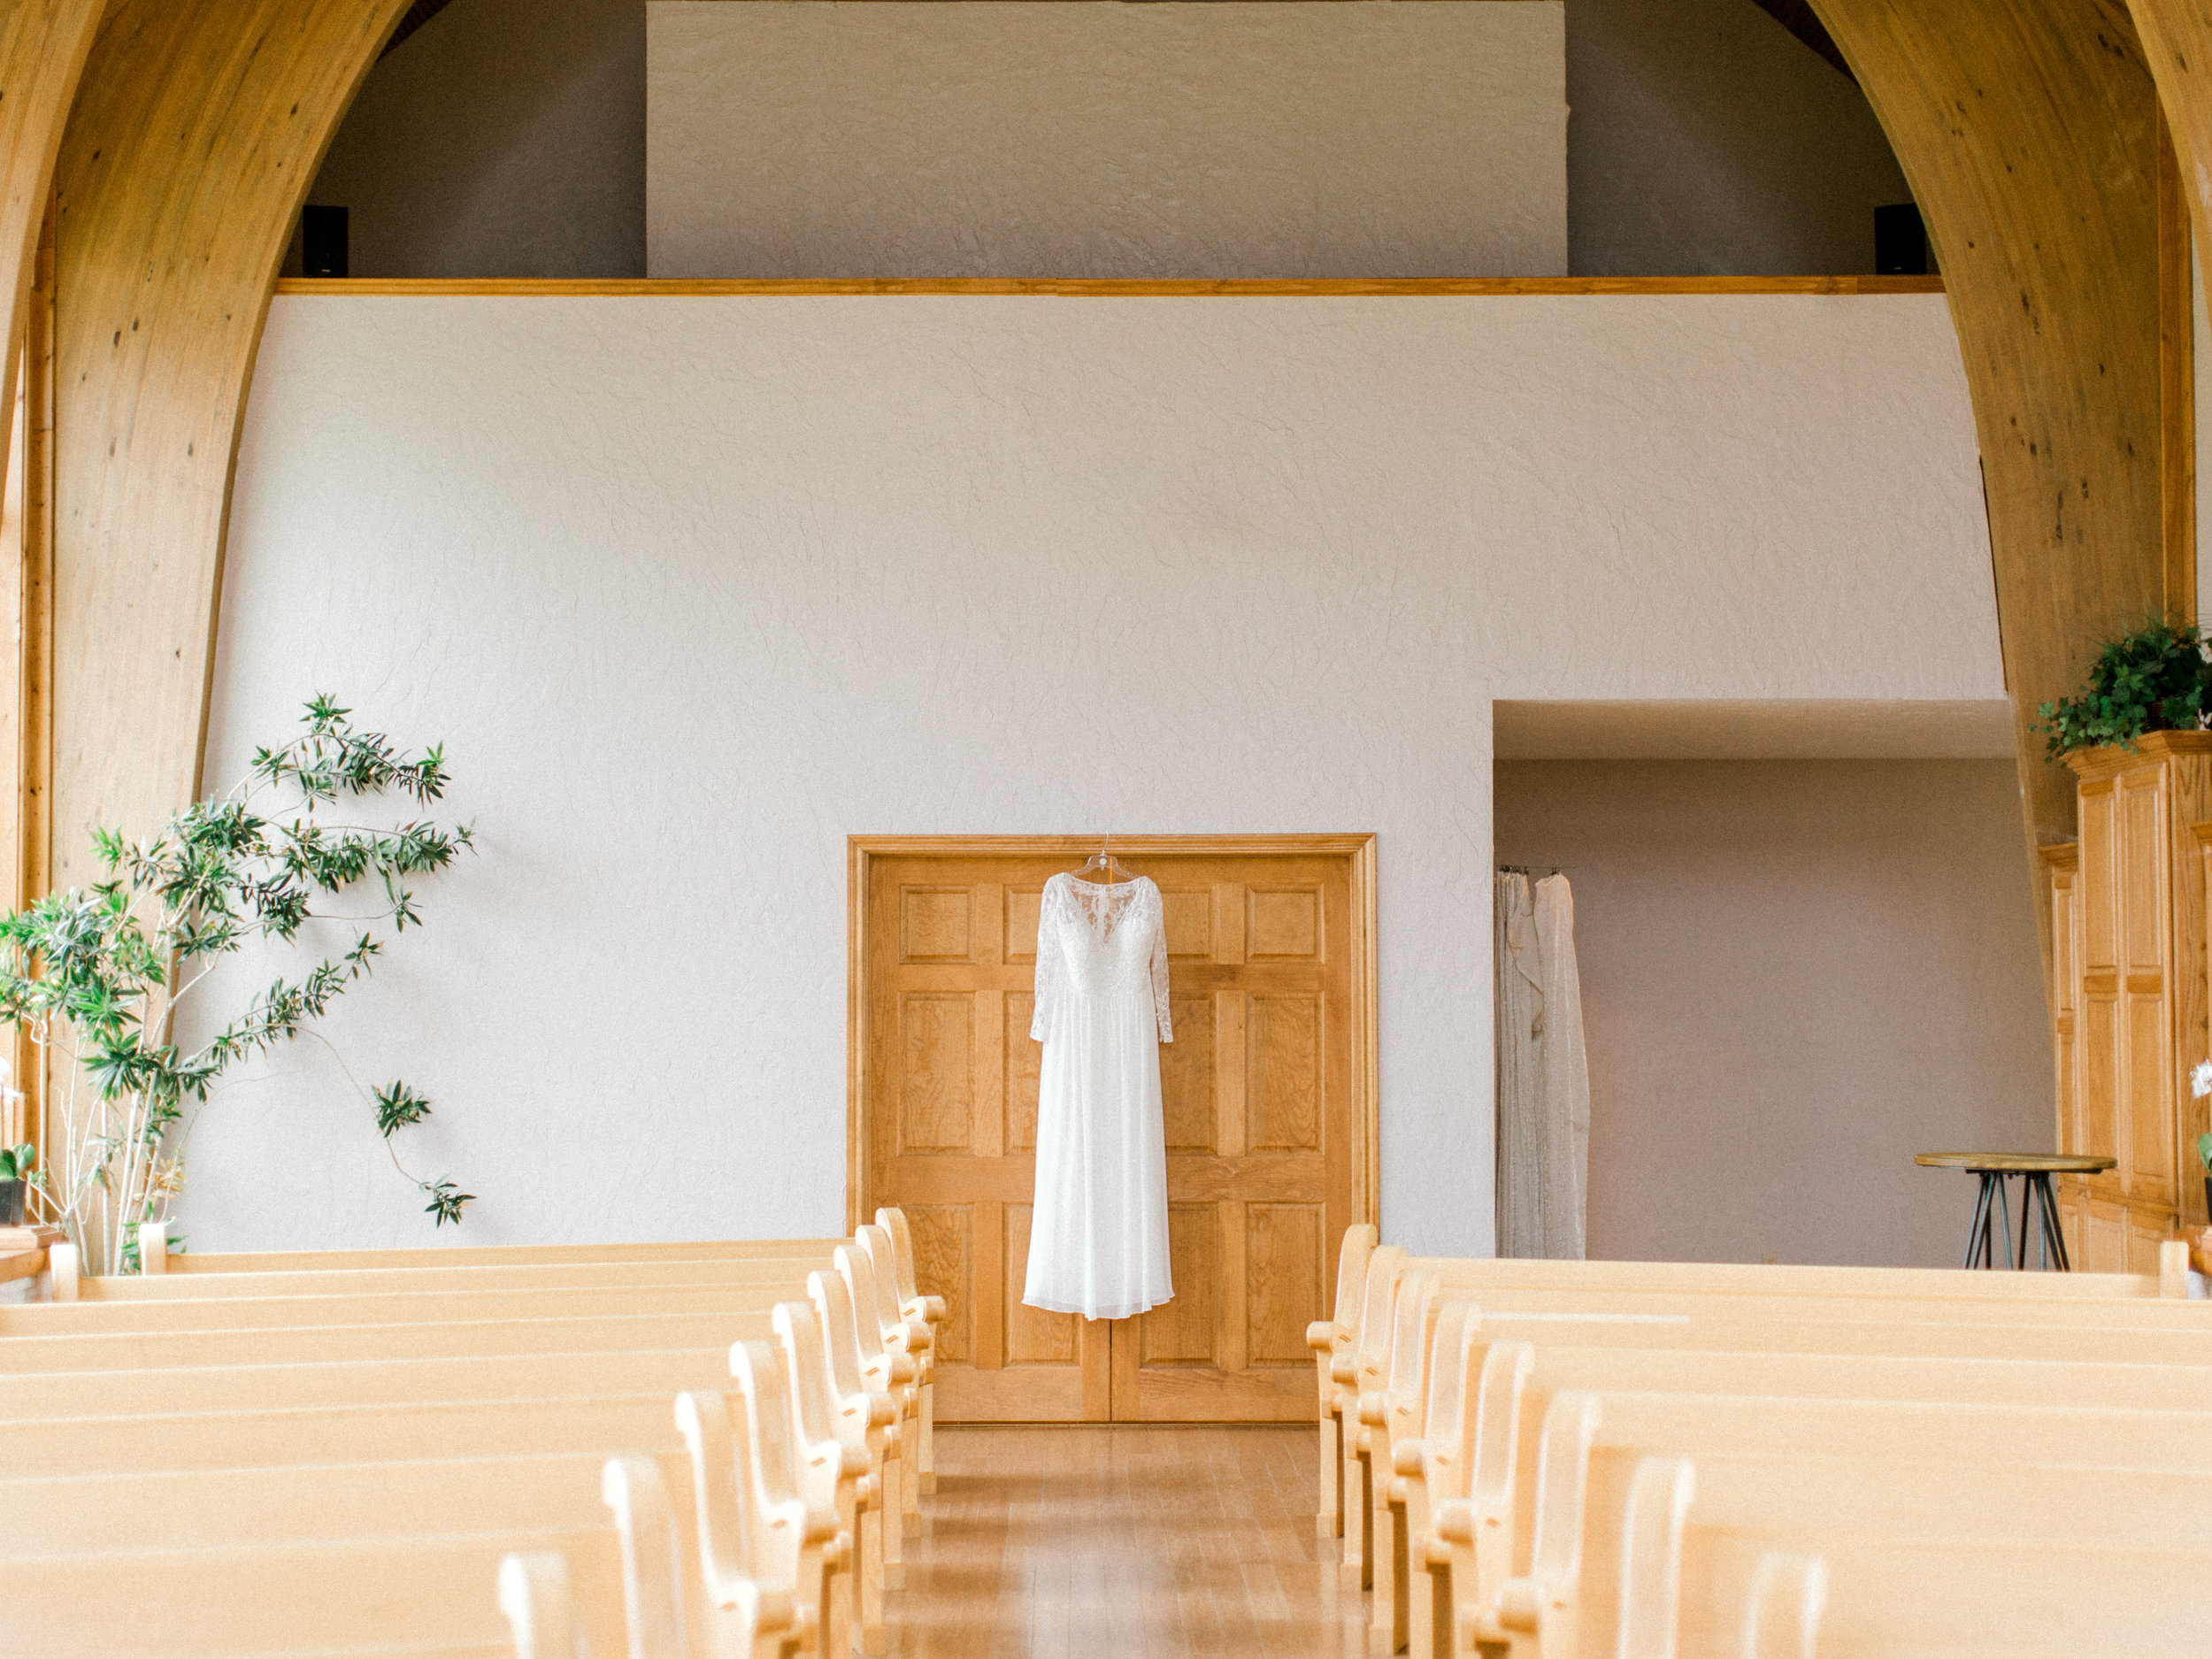 schwenke-harmony-chapel-details-6.jpg